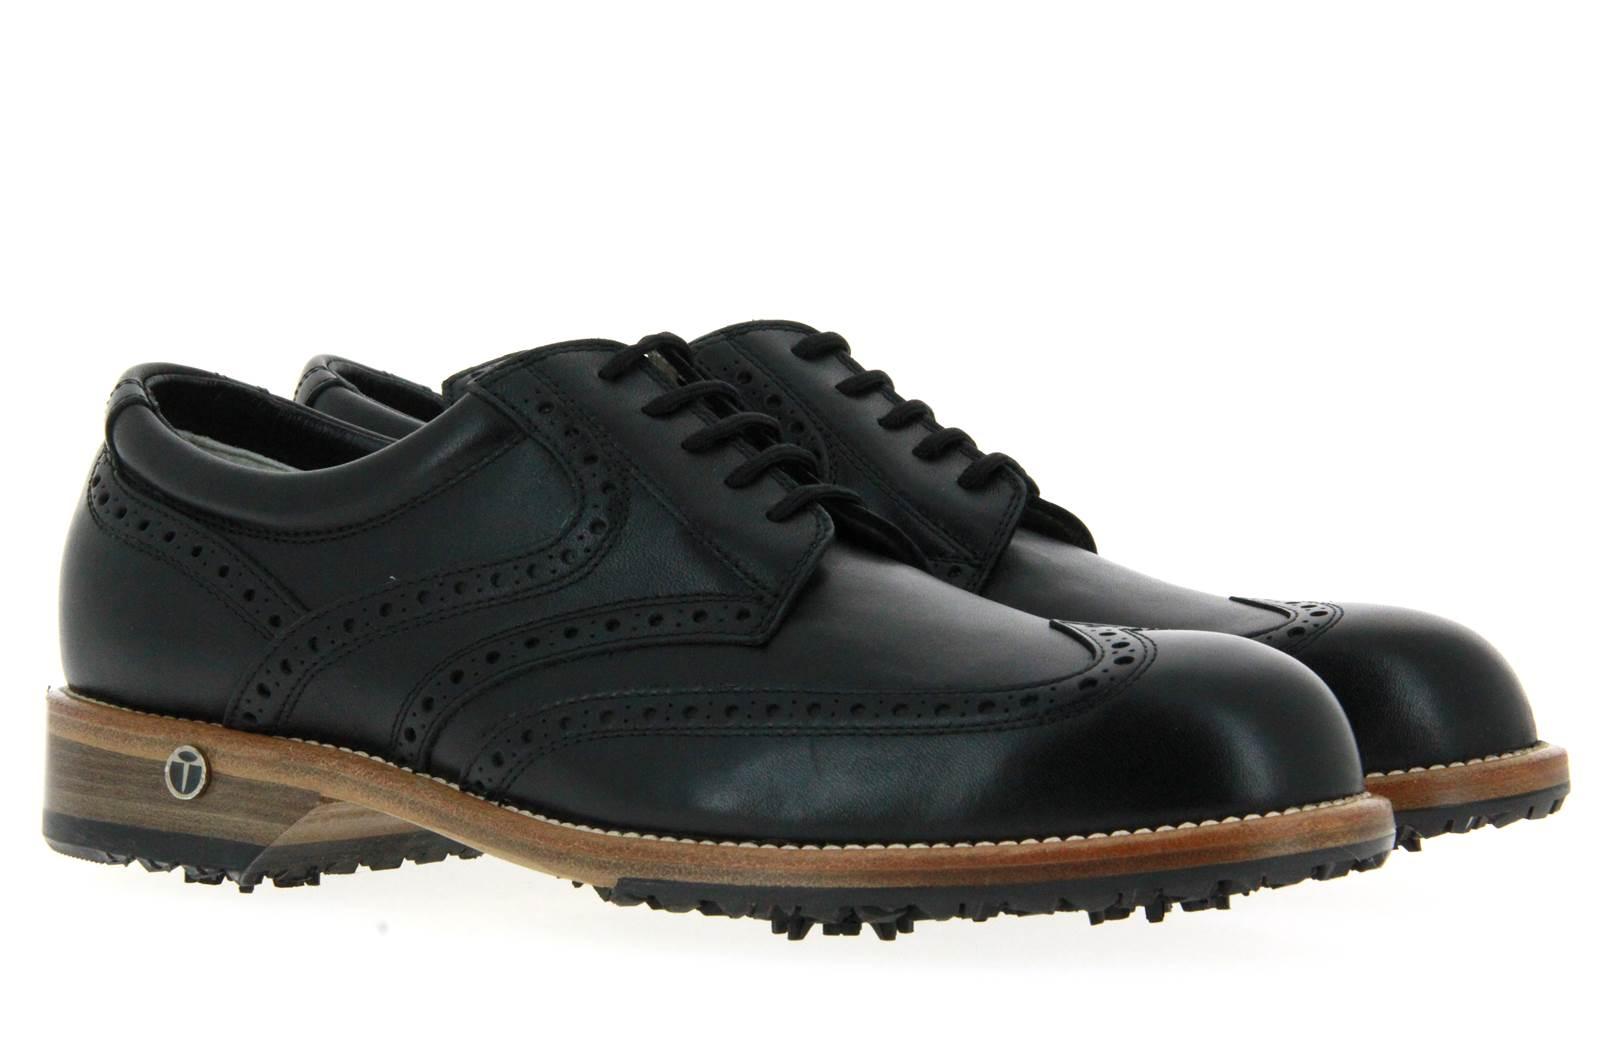 Tee Shoes golf shoe TOMMY VITELLO IDRO NERO